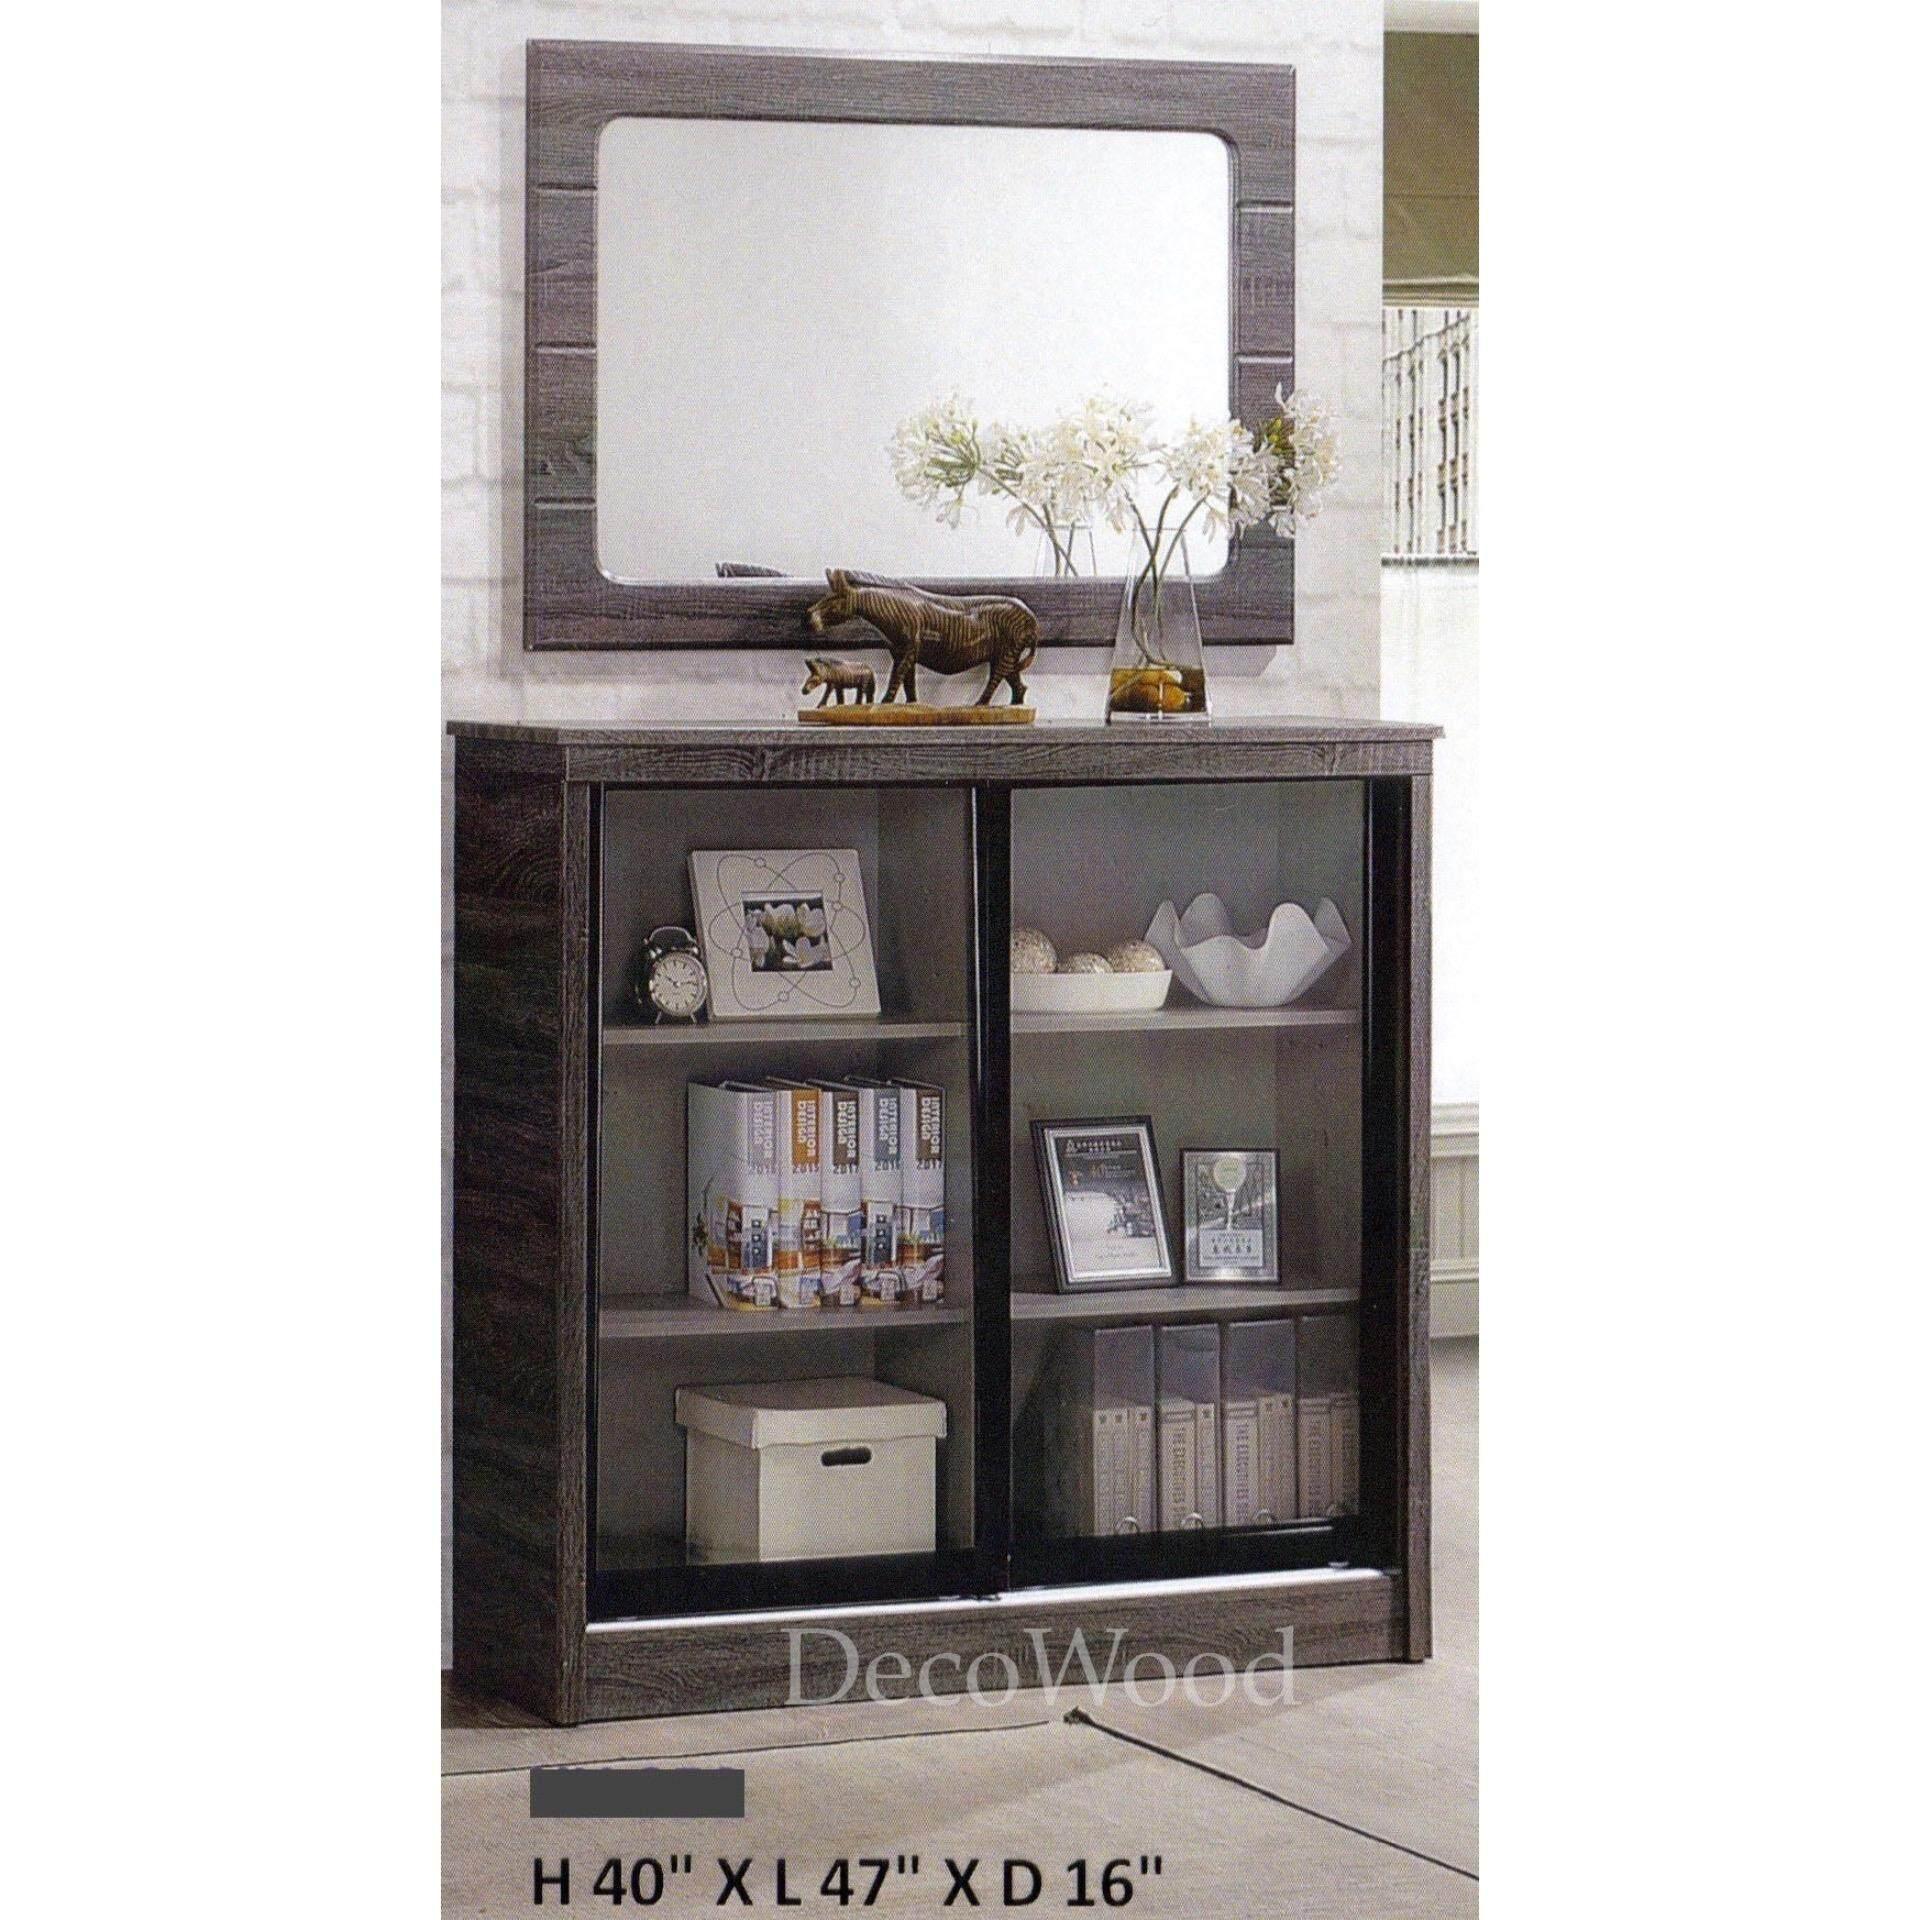 Ready-Fixed 4-Feet Sliding Glass Door Book Case Book Shelf Book Cabinet Multi-Purpose Display Cabinet Storage Cabinet (Dark Grey Colour) L1200MM X W410MM X H1020MM Pre Order 1 Week